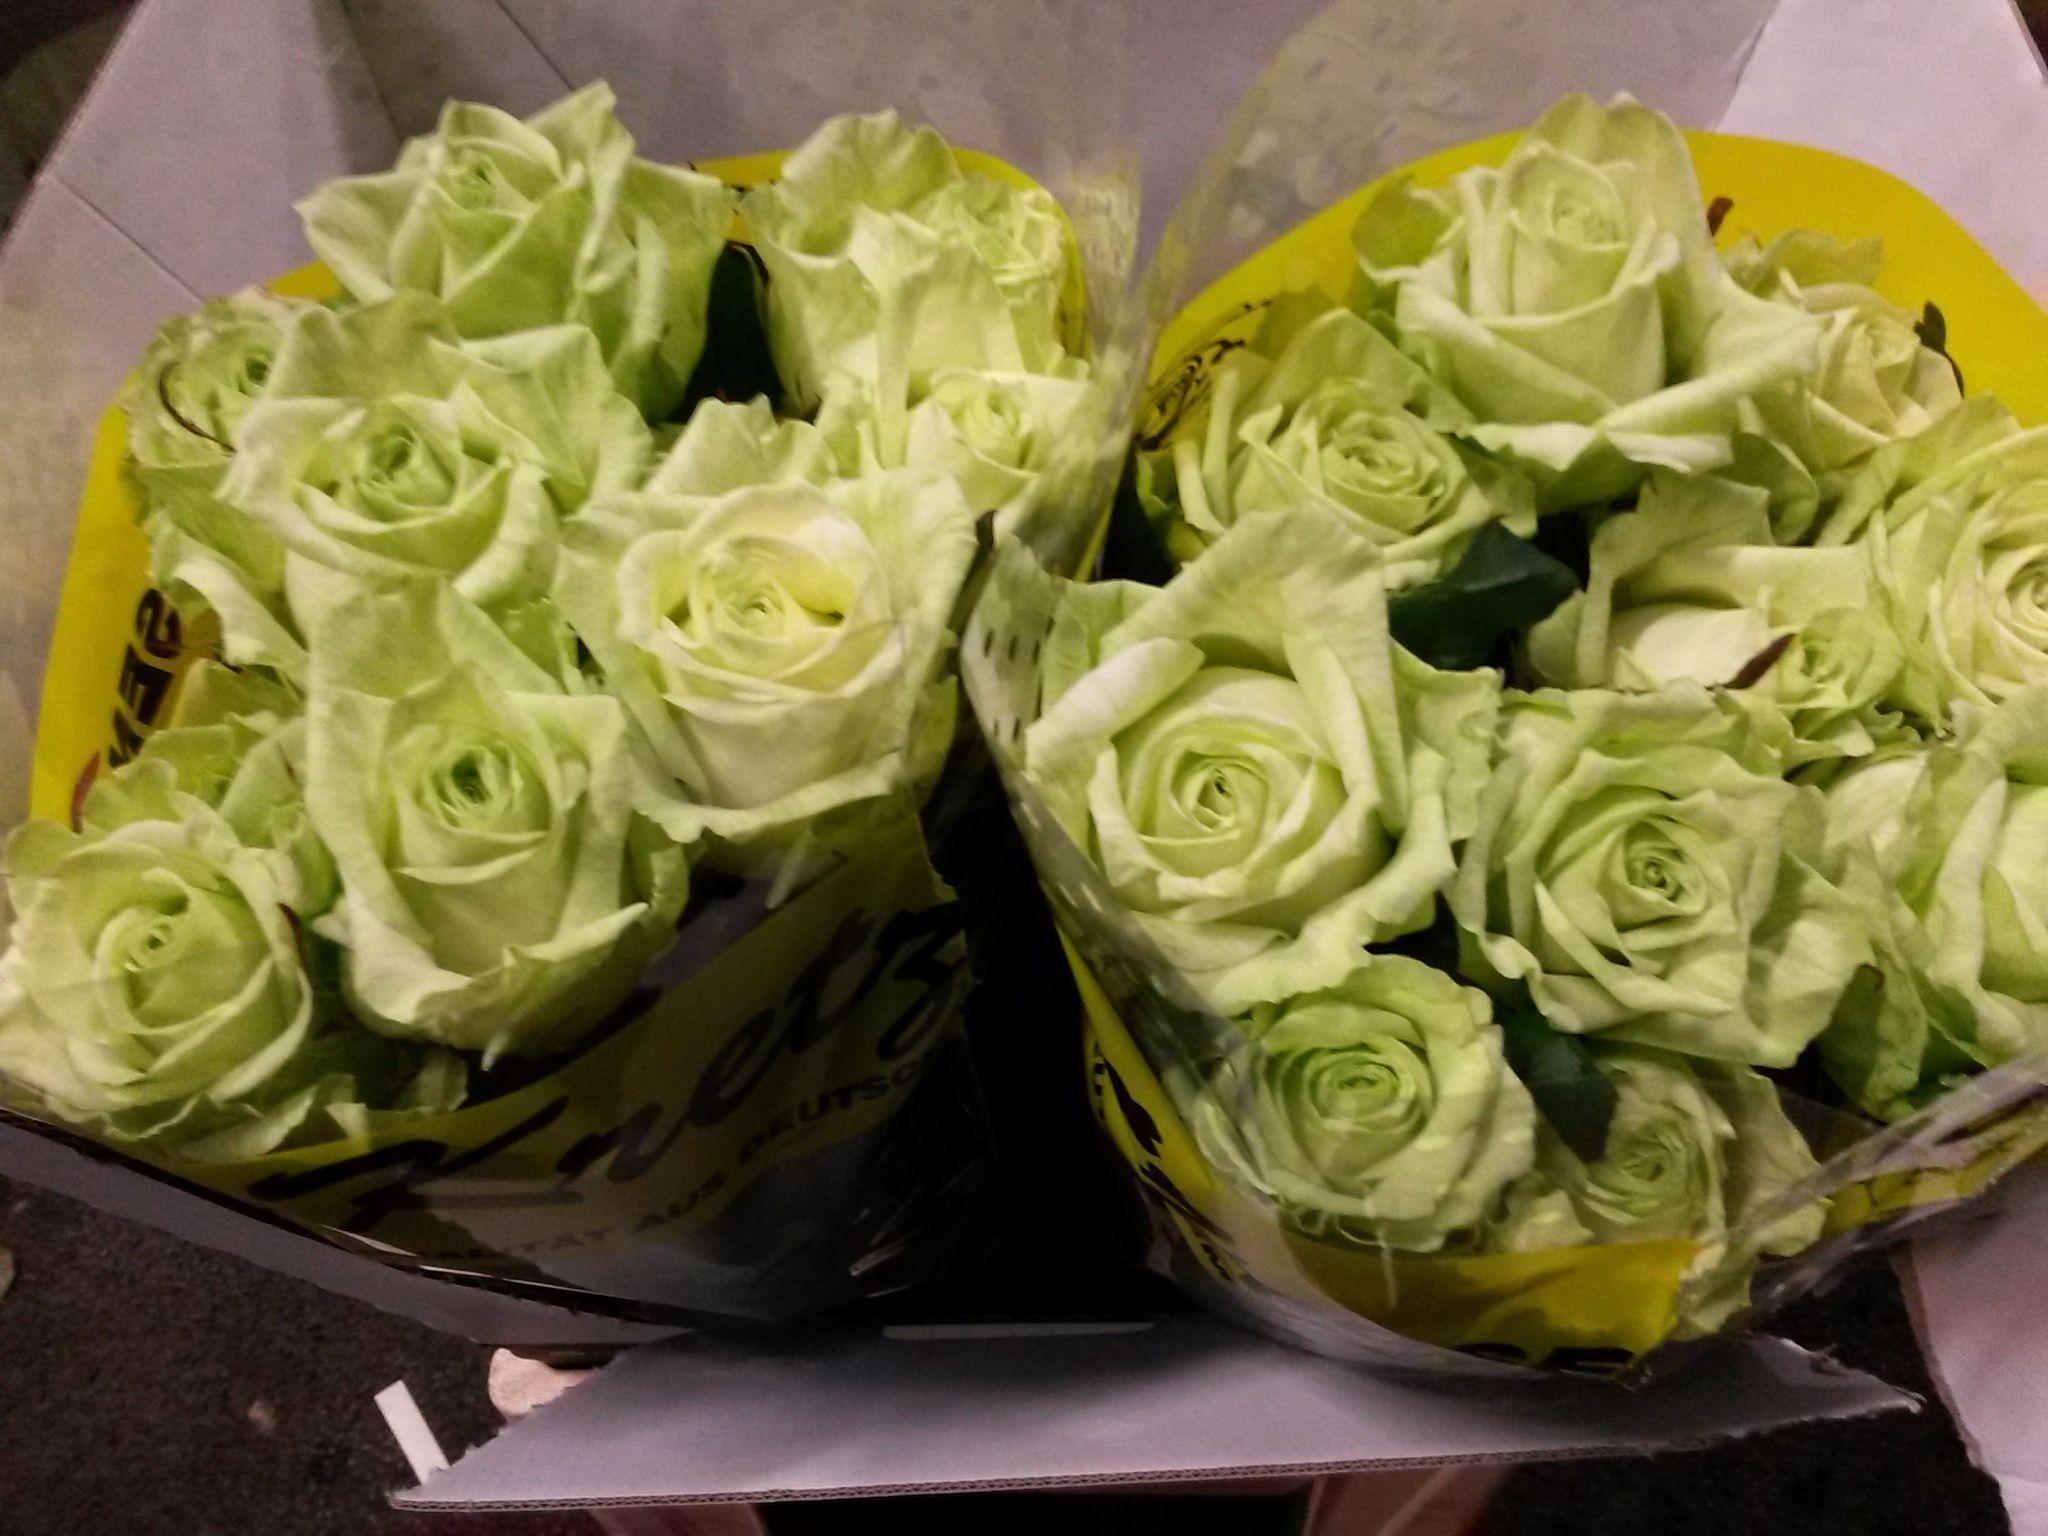 #Rosa #Rose #GlobalNaomi: Available at www.barendsen.nl